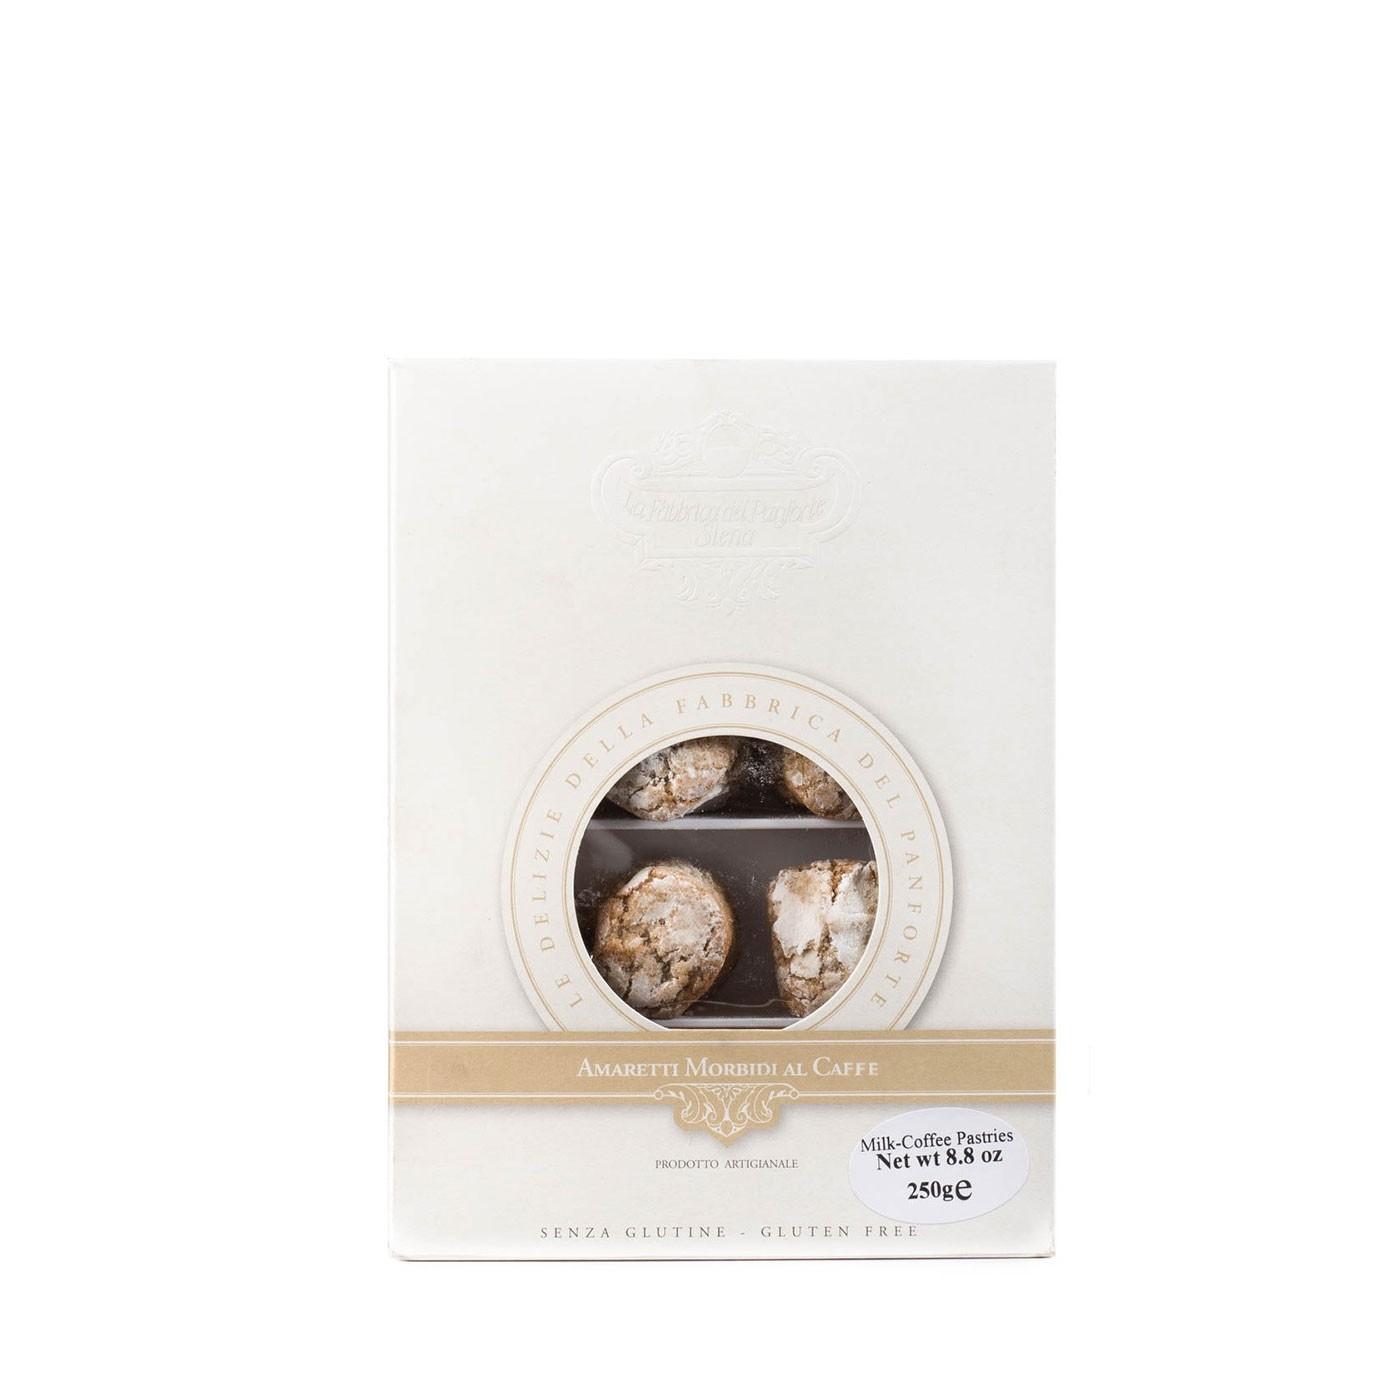 Soft Amaretti Cookies with Coffee 8.8 oz - Fabbrica Del Panforte | Eataly.com